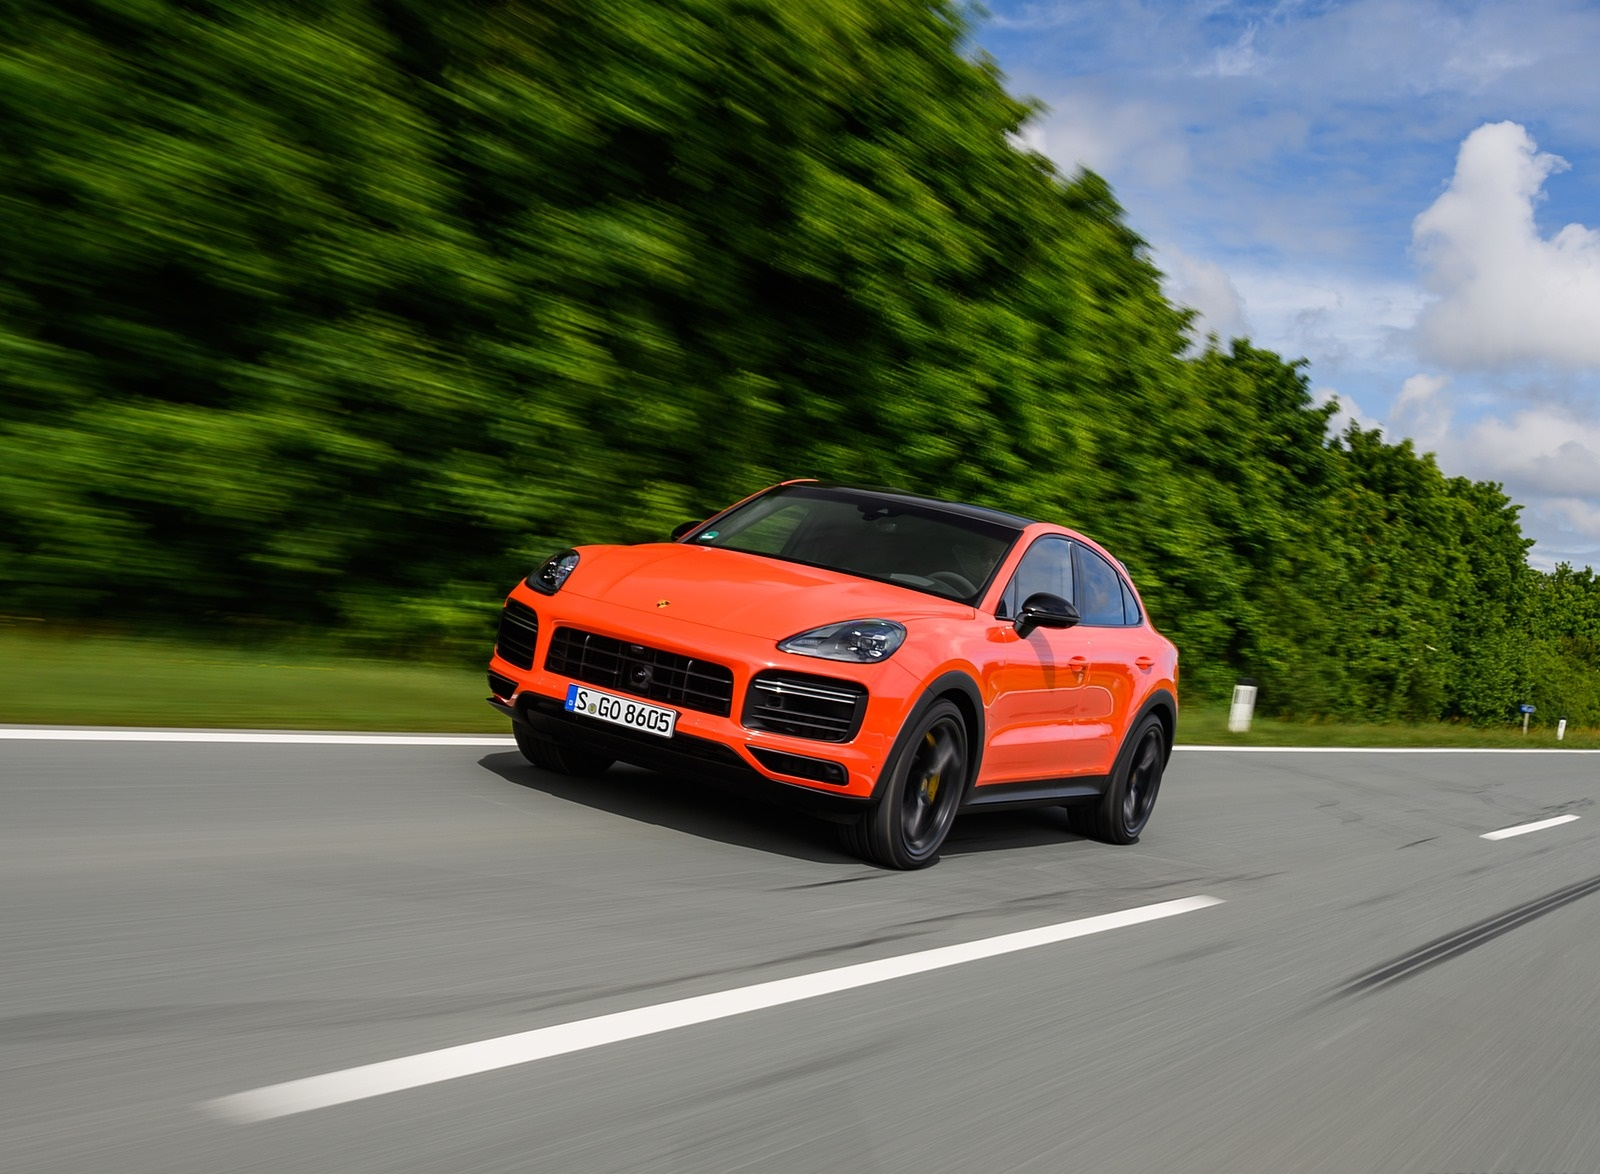 2020 Porsche Cayenne Turbo Coupe (Color: Lava Orange) Front Three-Quarter Wallpapers (11)